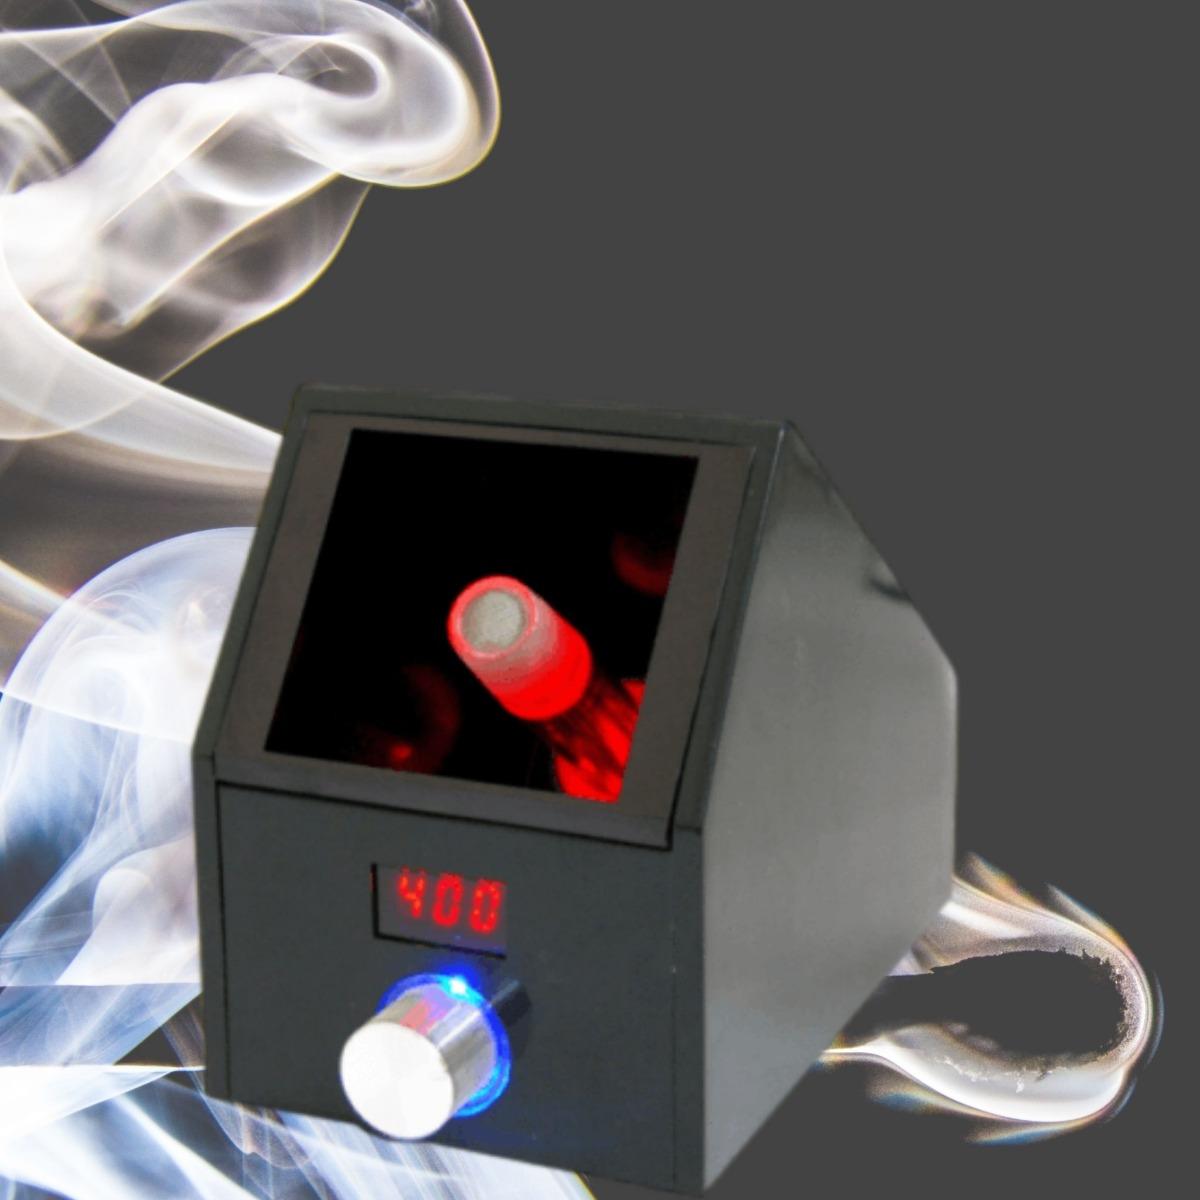 Black desktop vaporizer with smoke in the background